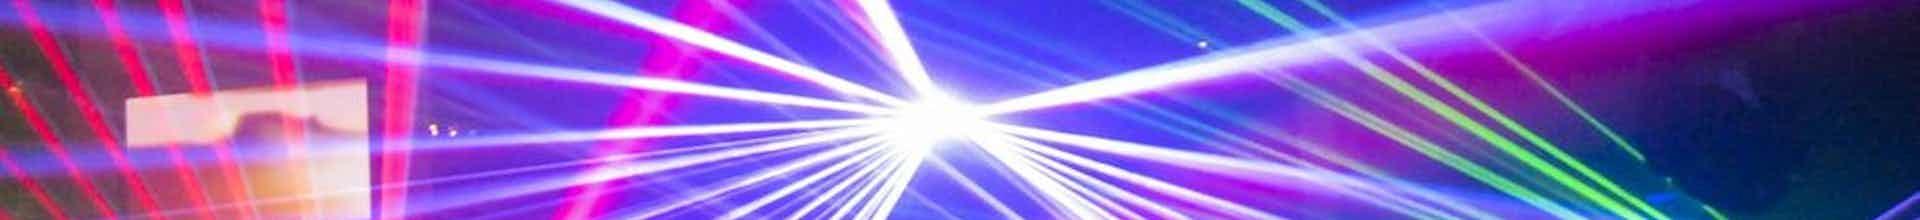 lasershow_1